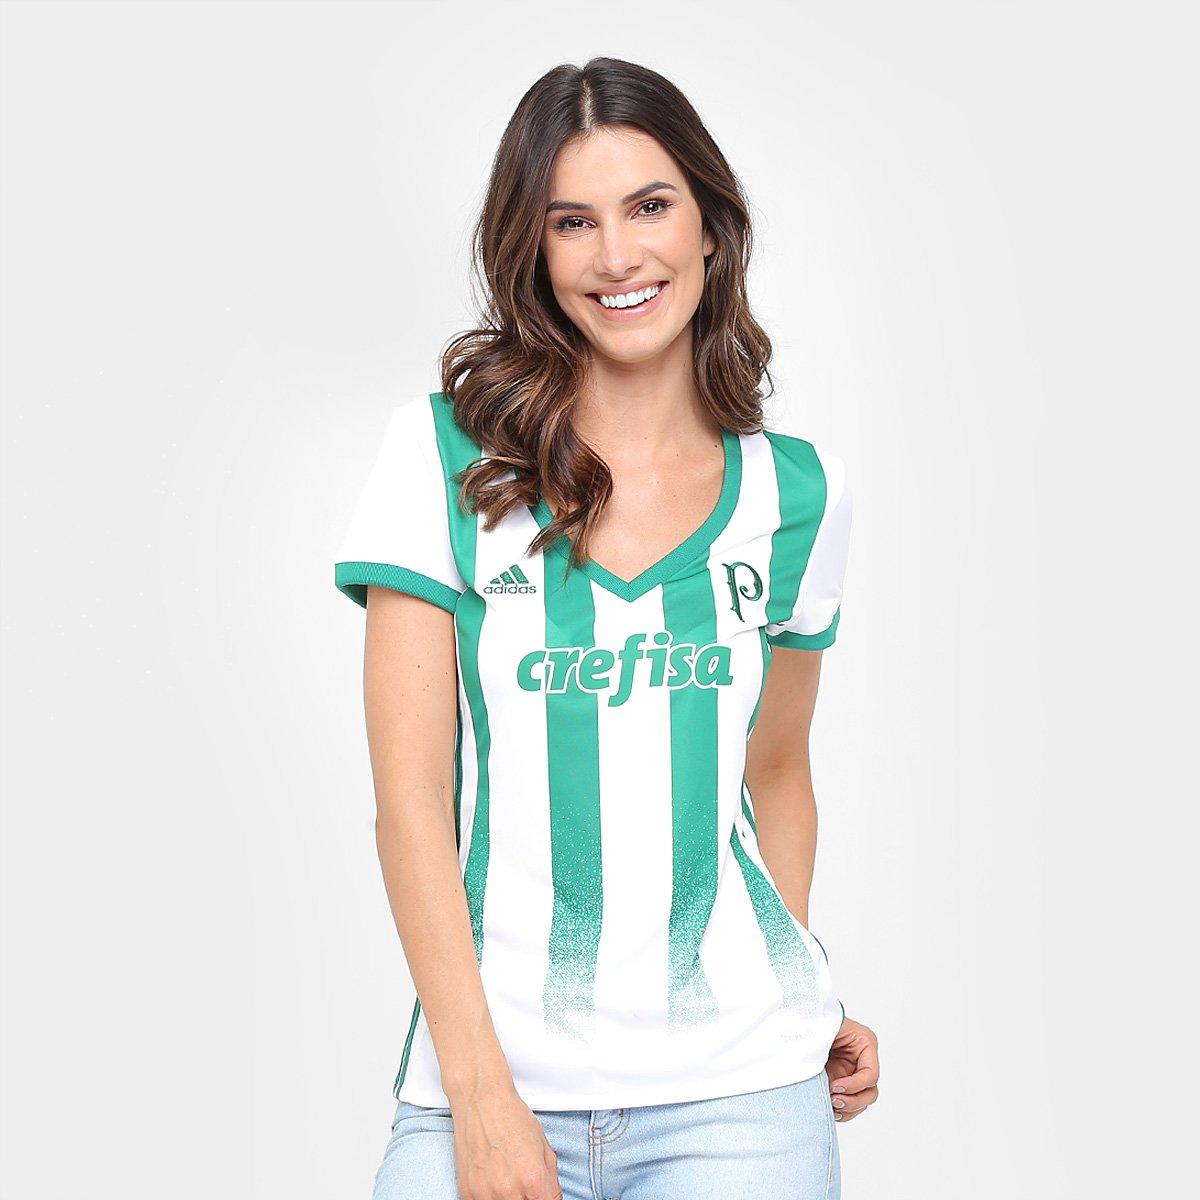 3238795d52 Camisa Palmeiras II 17/18 s/nº Torcedor Adidas Feminina   Allianz Parque  Shop